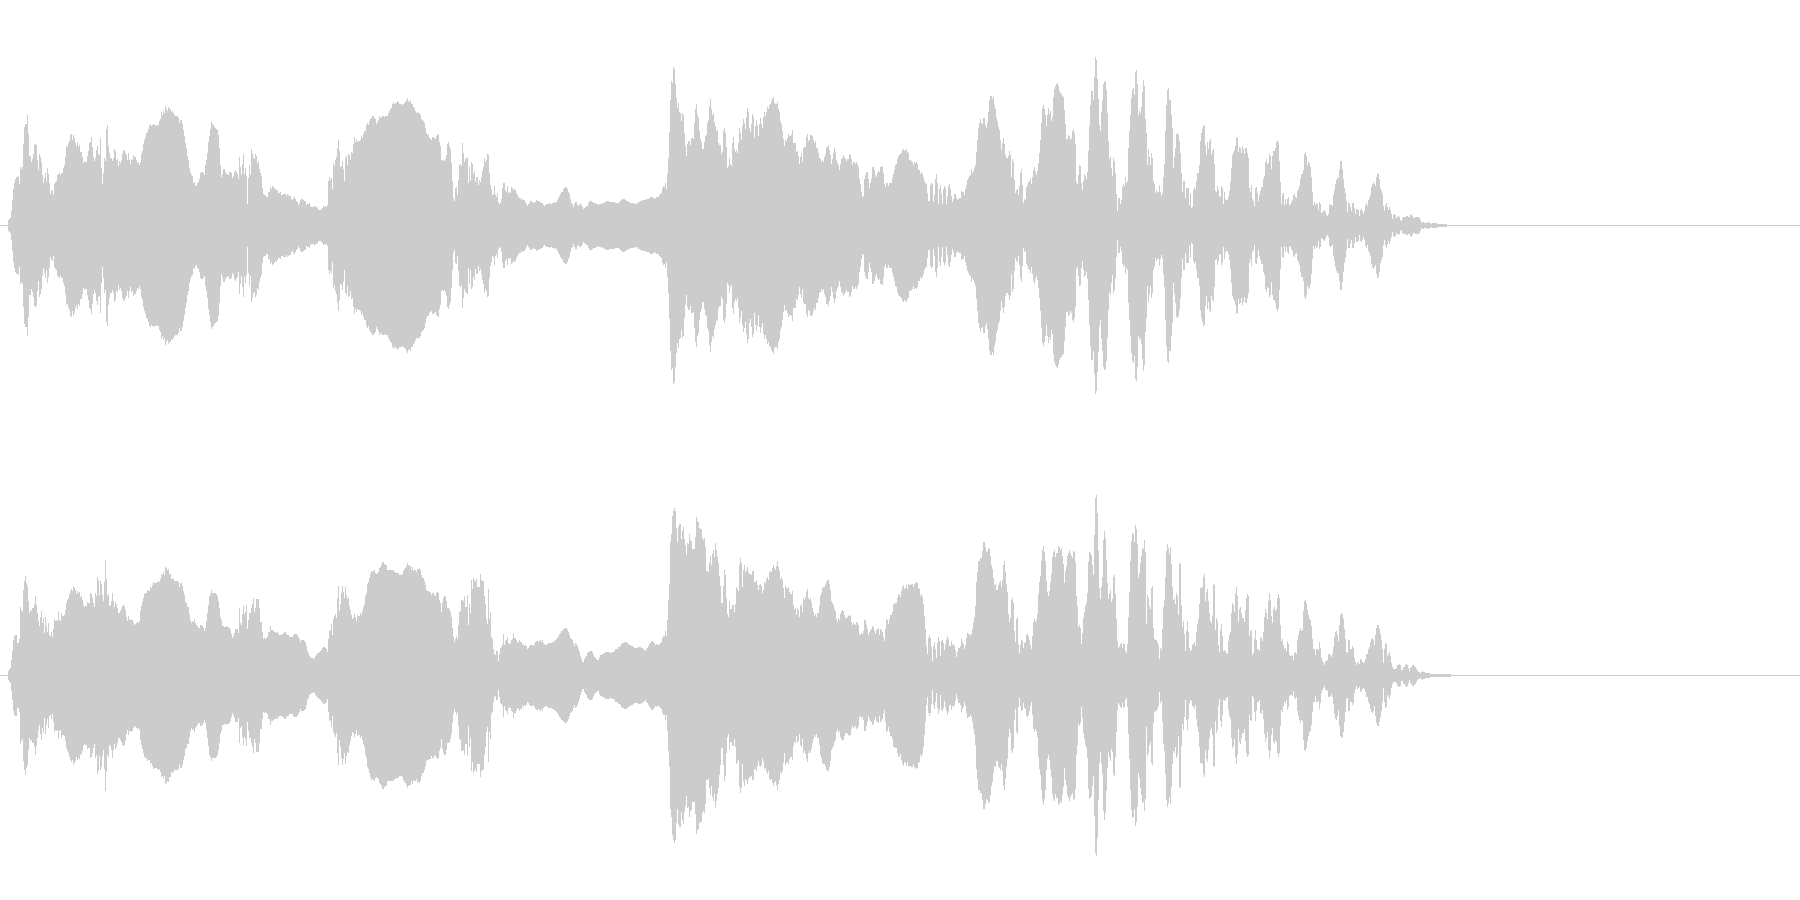 尺八 生演奏 古典風 残響音無 10の未再生の波形